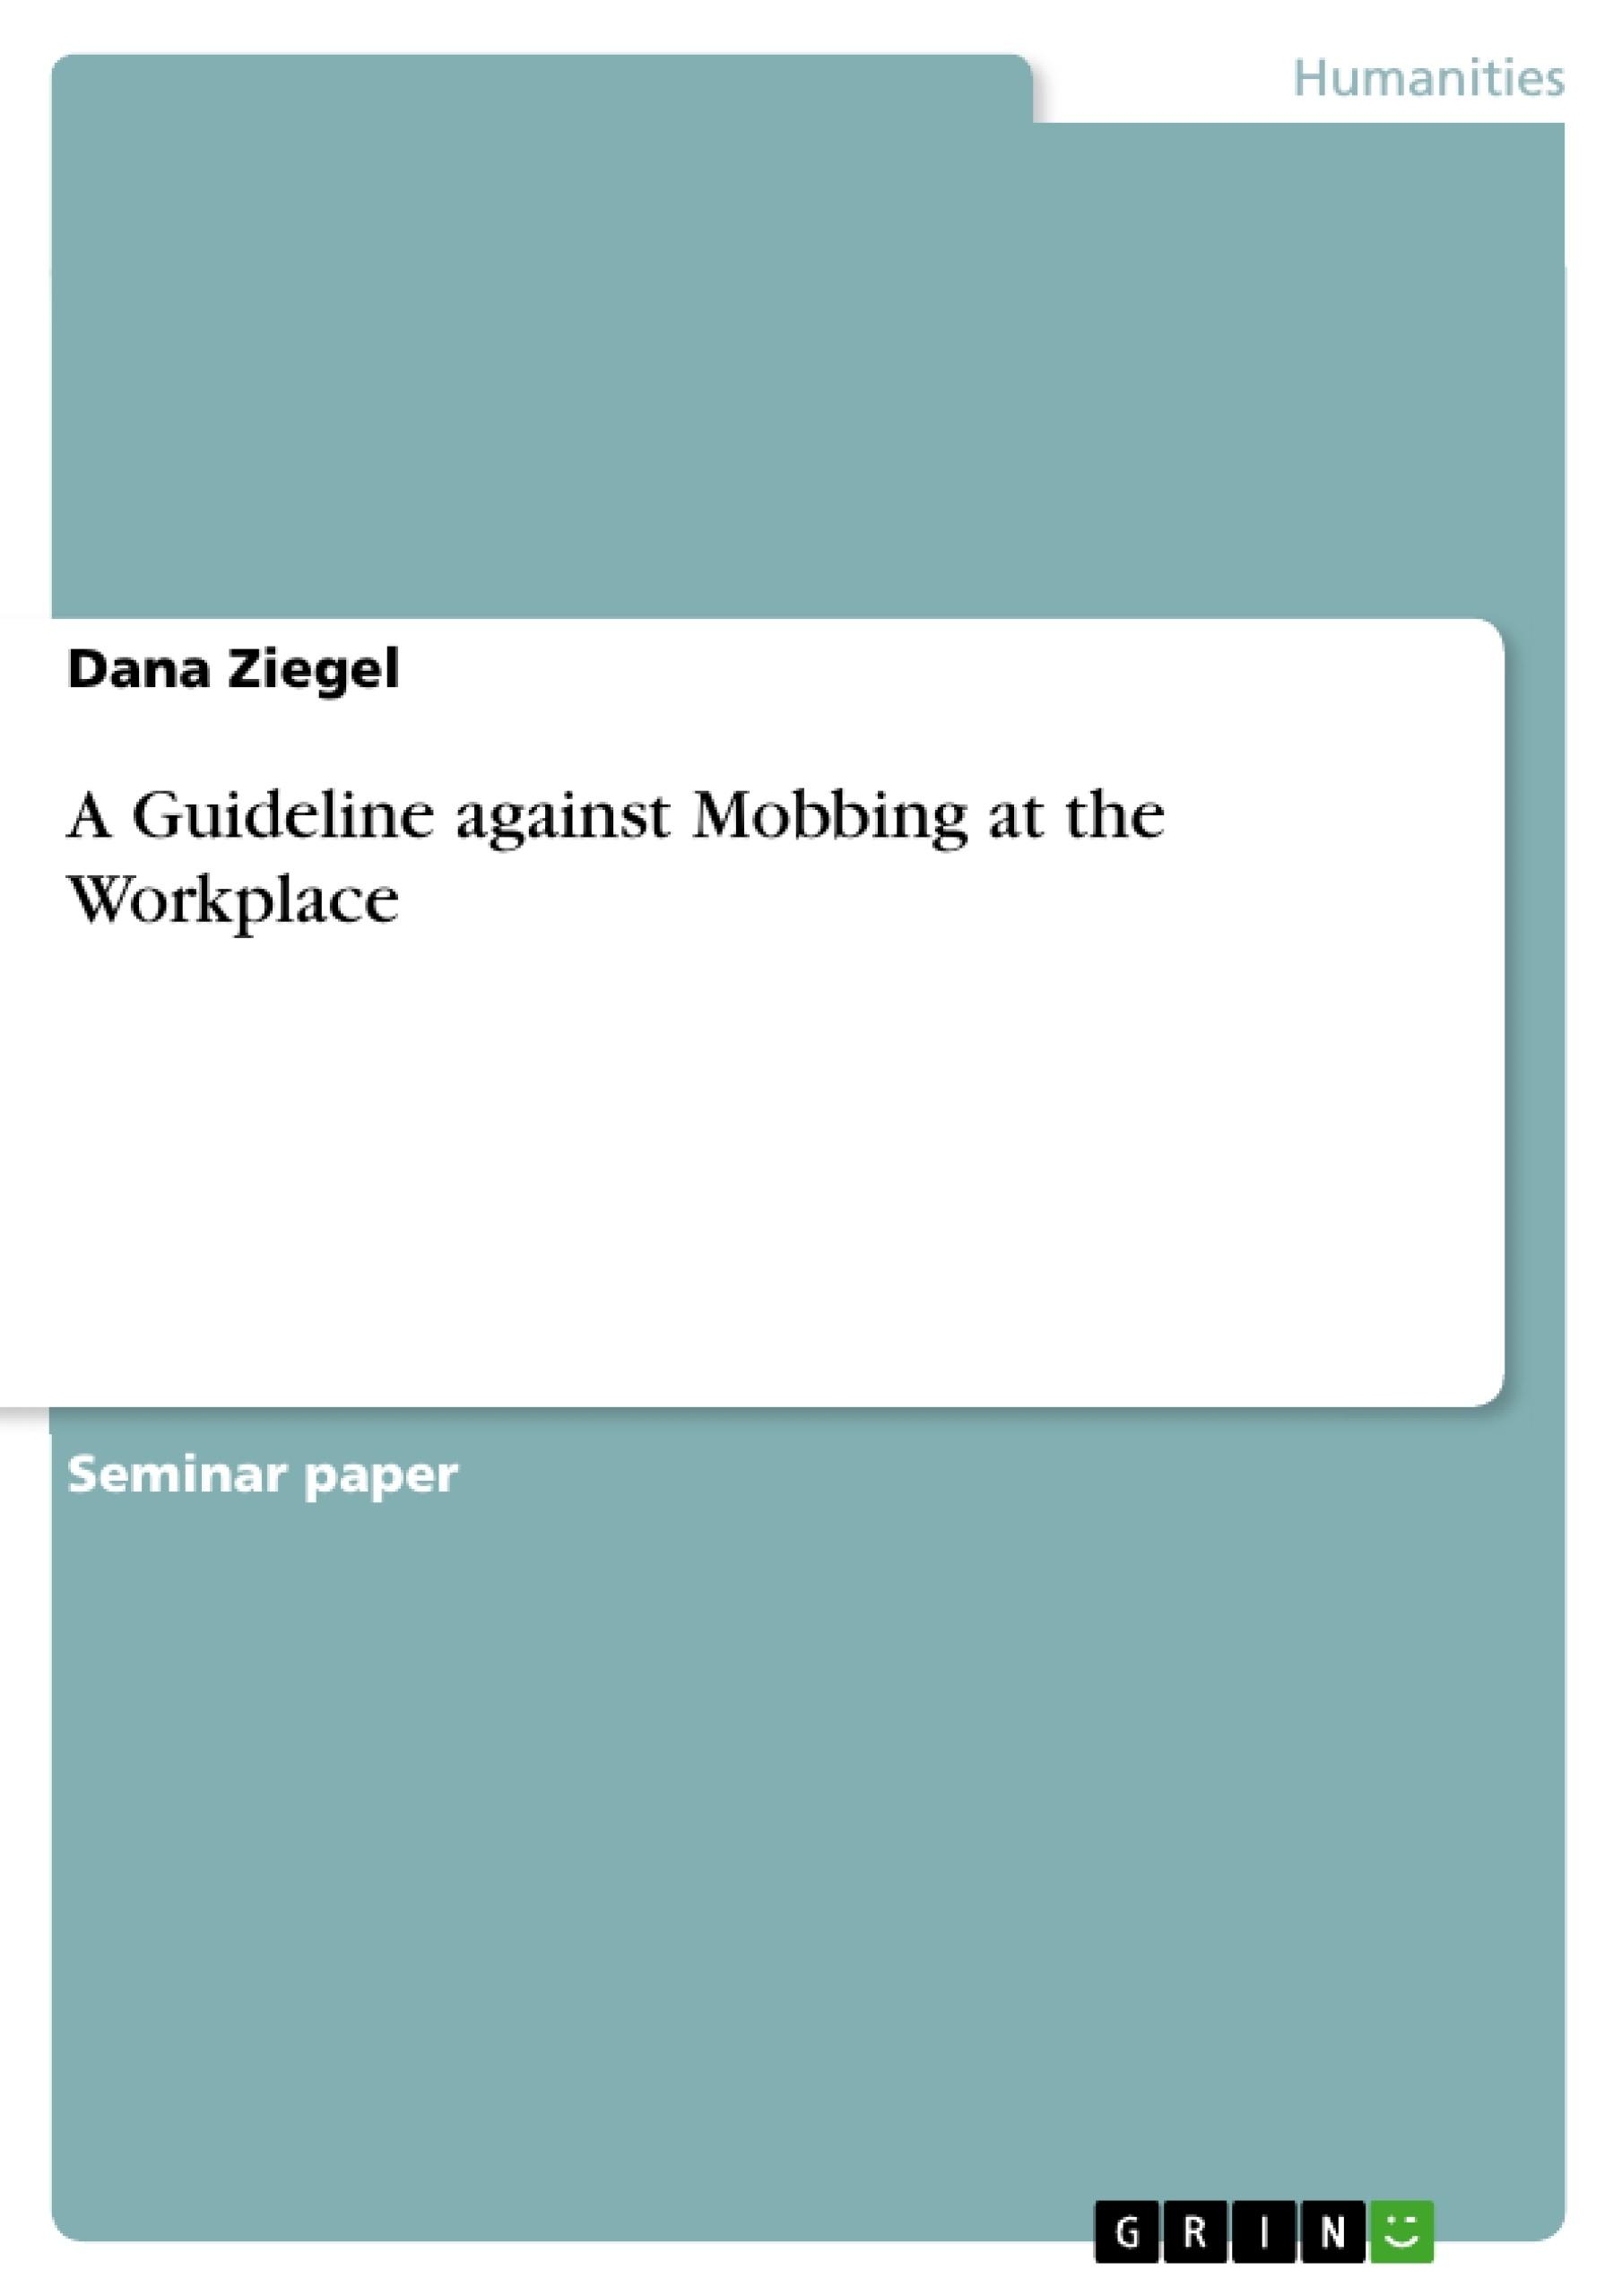 mobbing essay The founder of the international movement in sweden, heinz leymann tags: heinz leymann, ken westhues, mobbing, mobbing portal, workplace bullying.